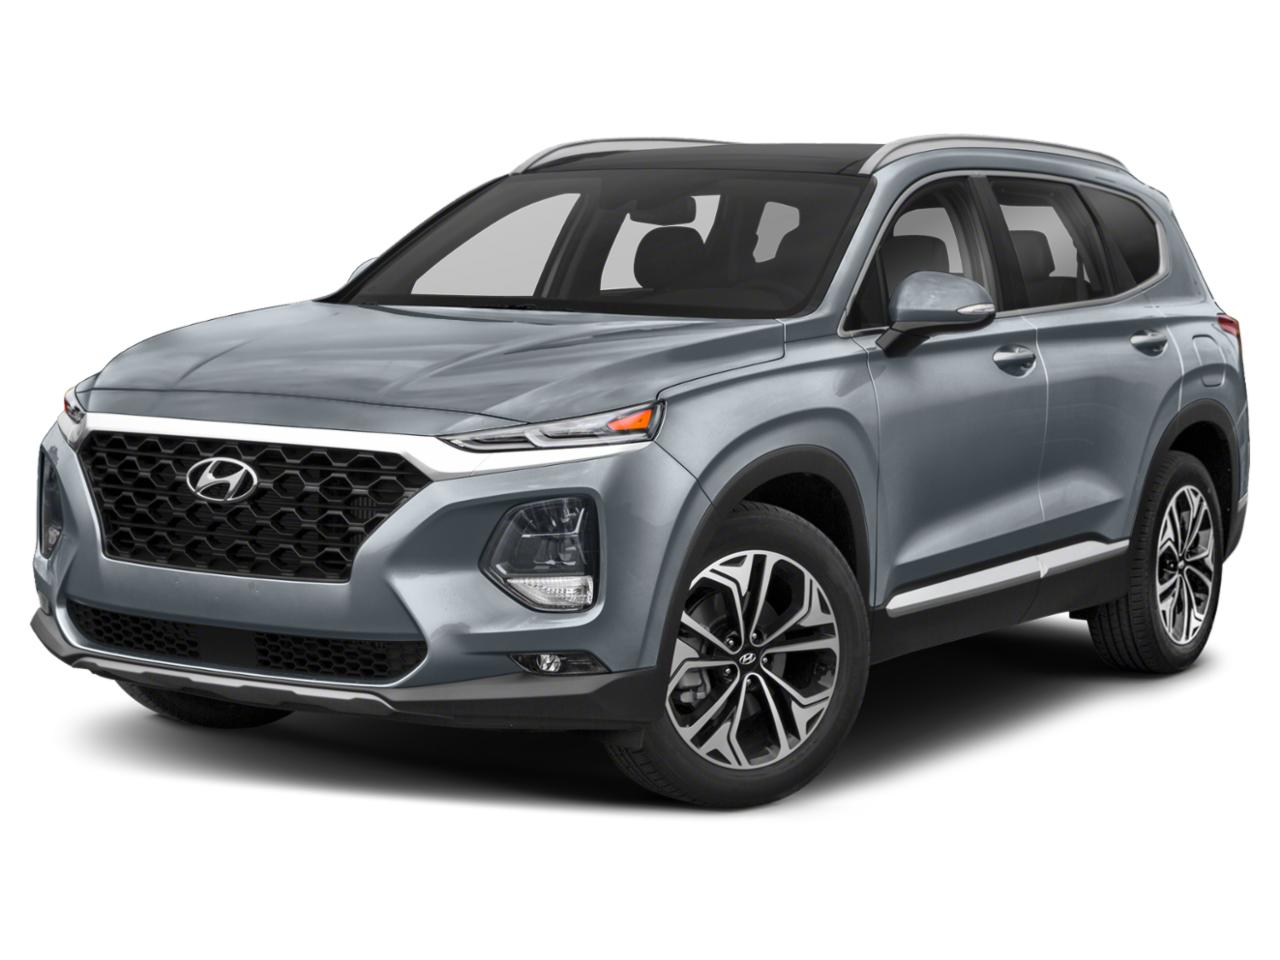 2020 Hyundai Santa Fe Vehicle Photo in Merrillville, IN 46410